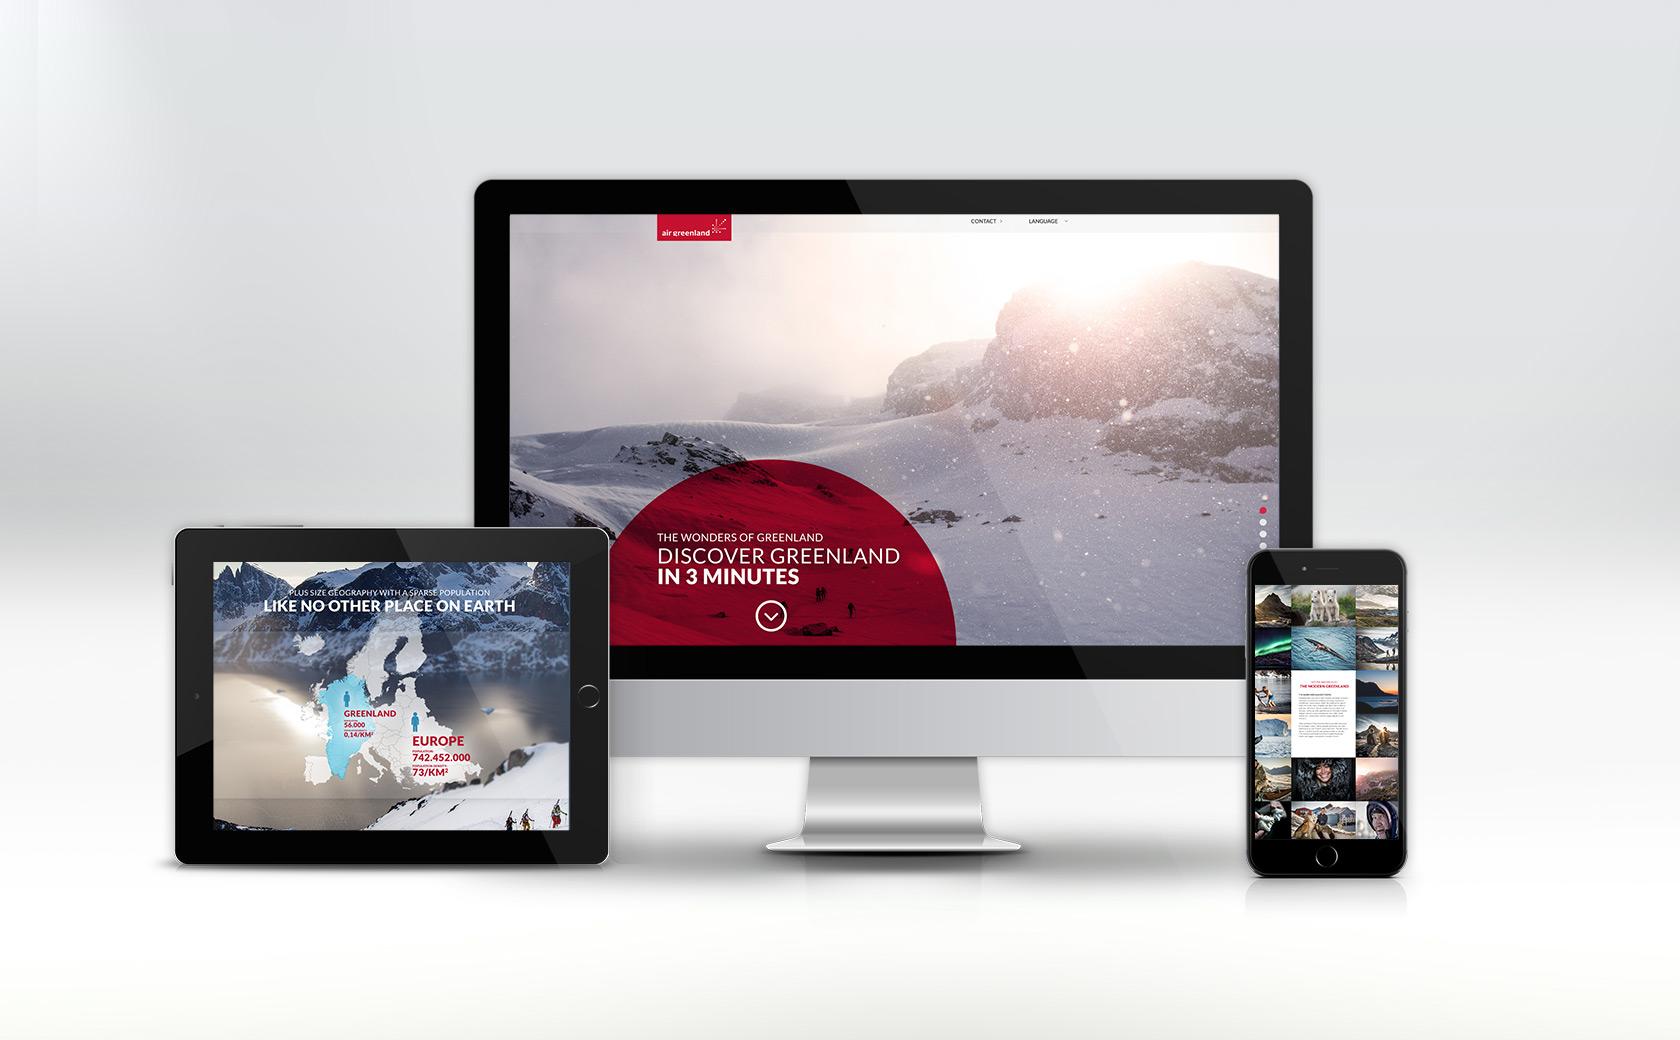 Greenland in 3 min website